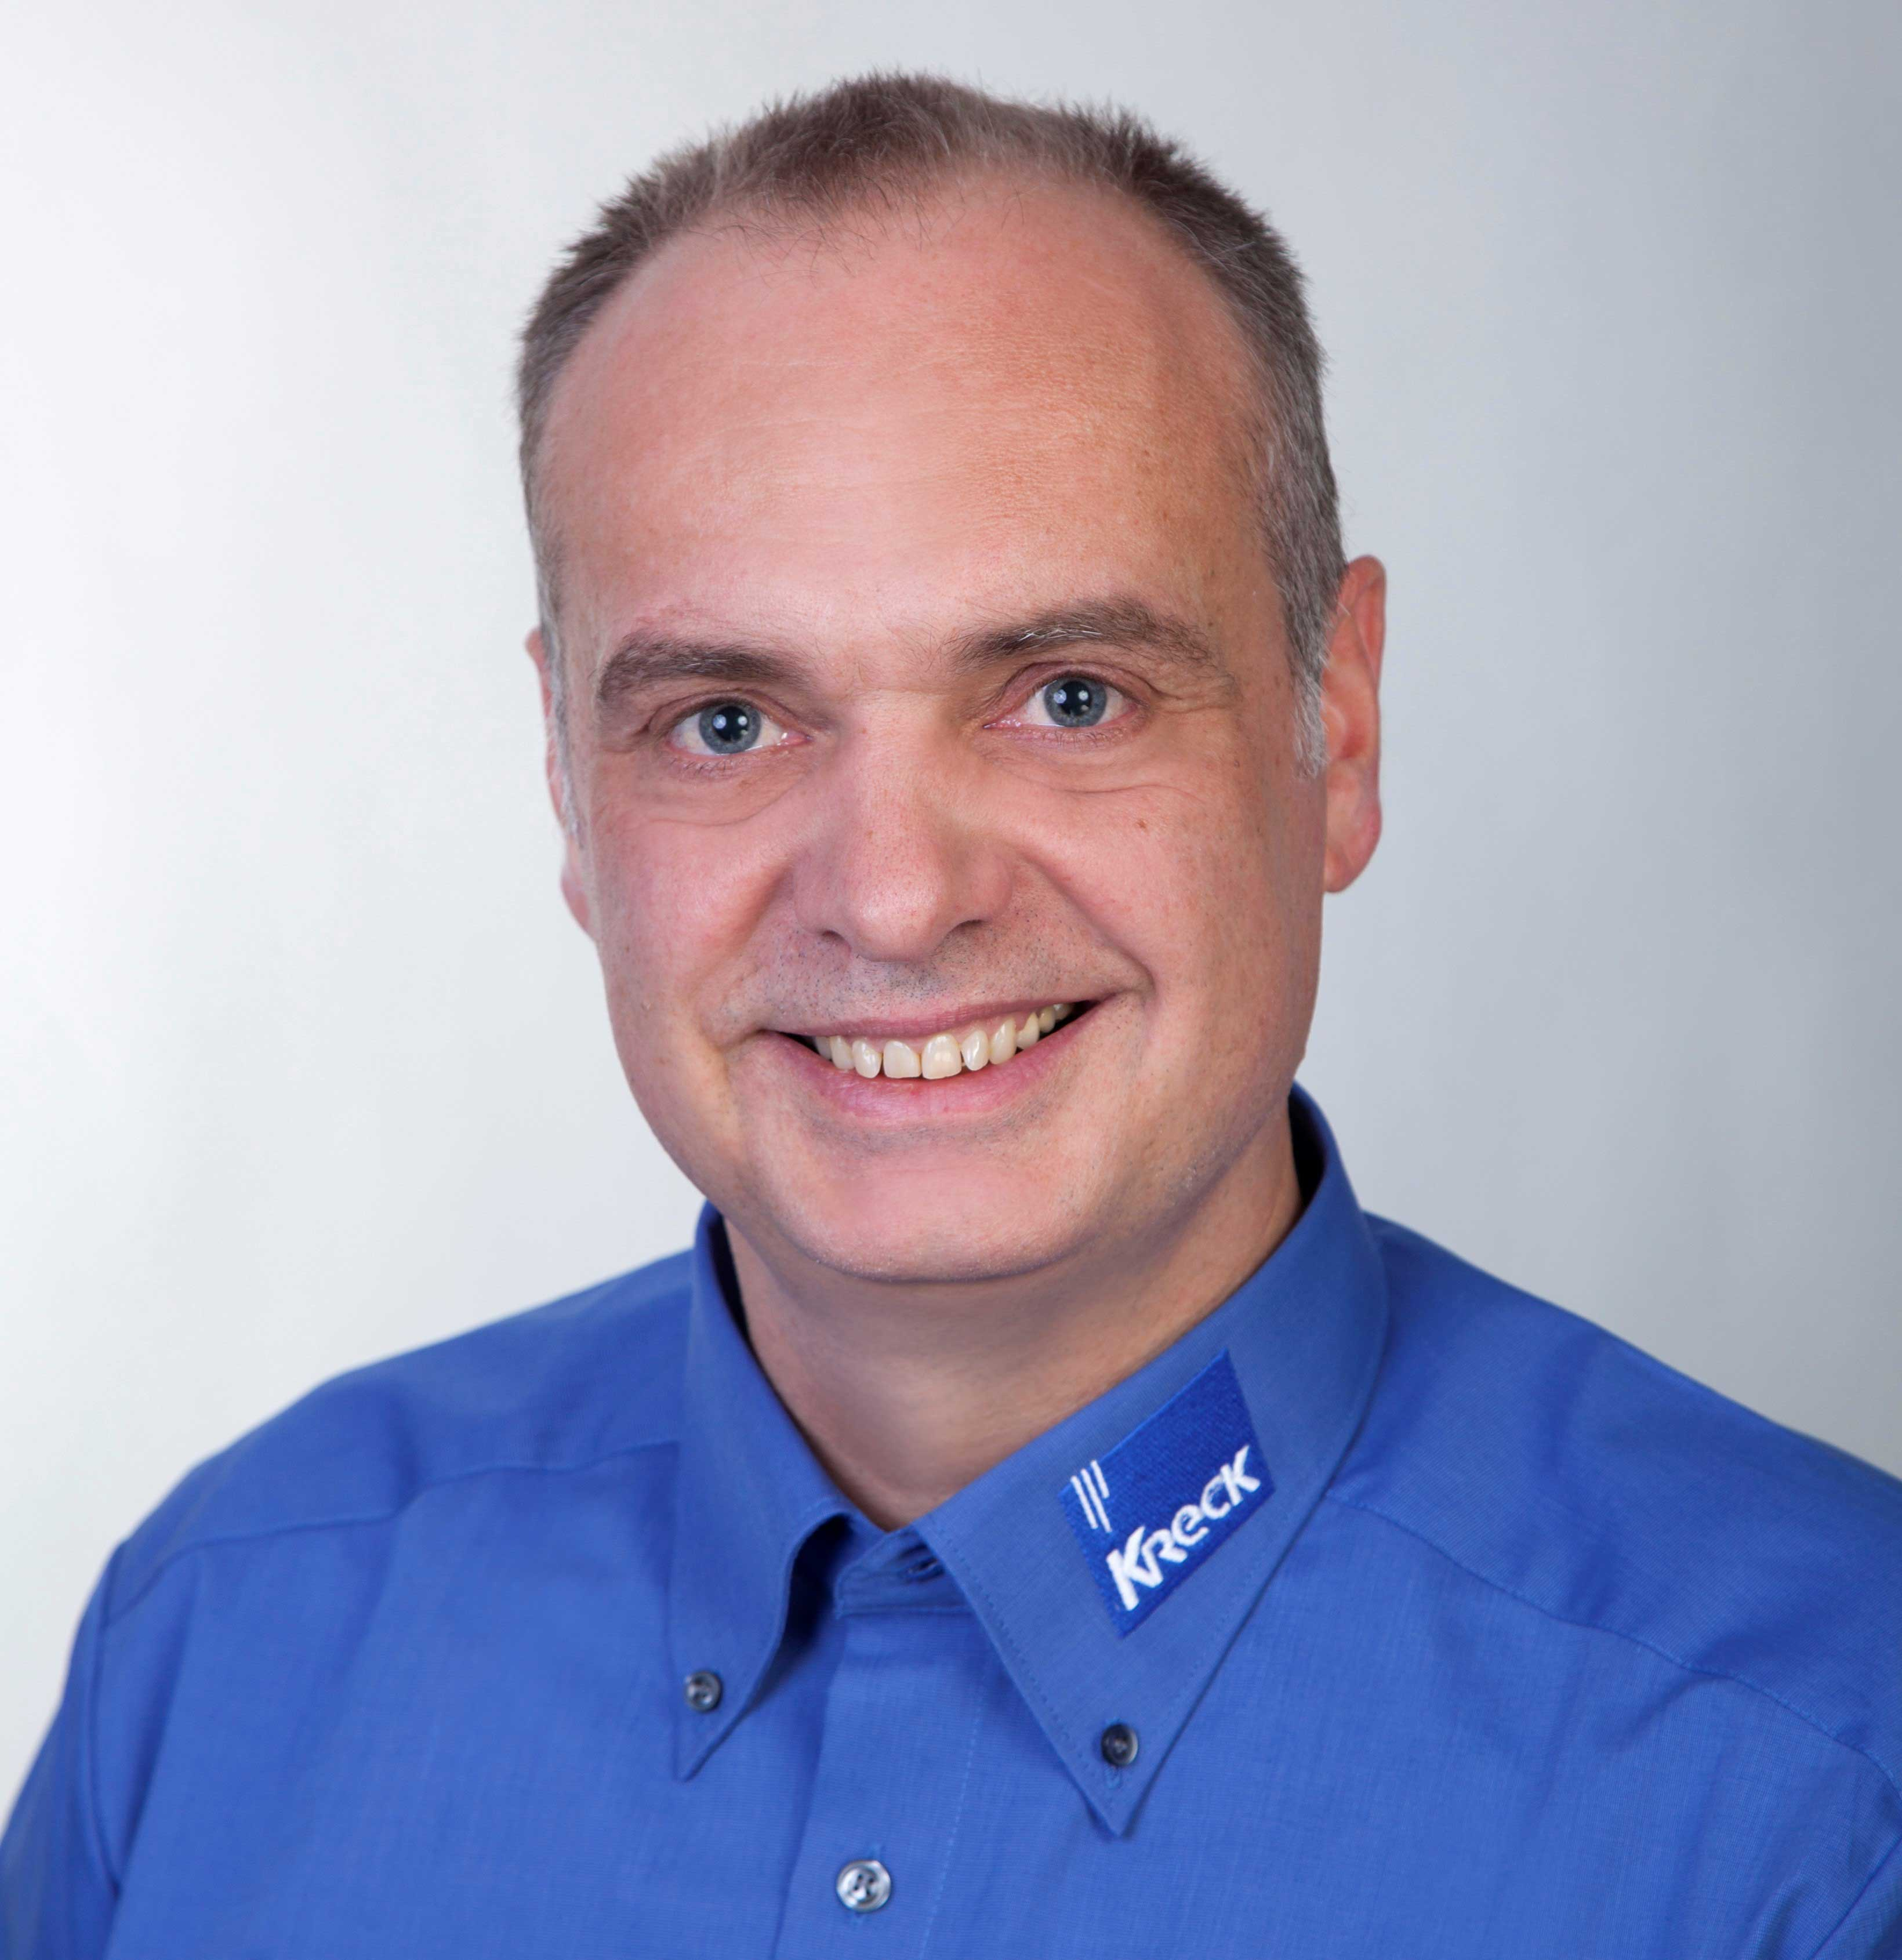 Matthias Plate